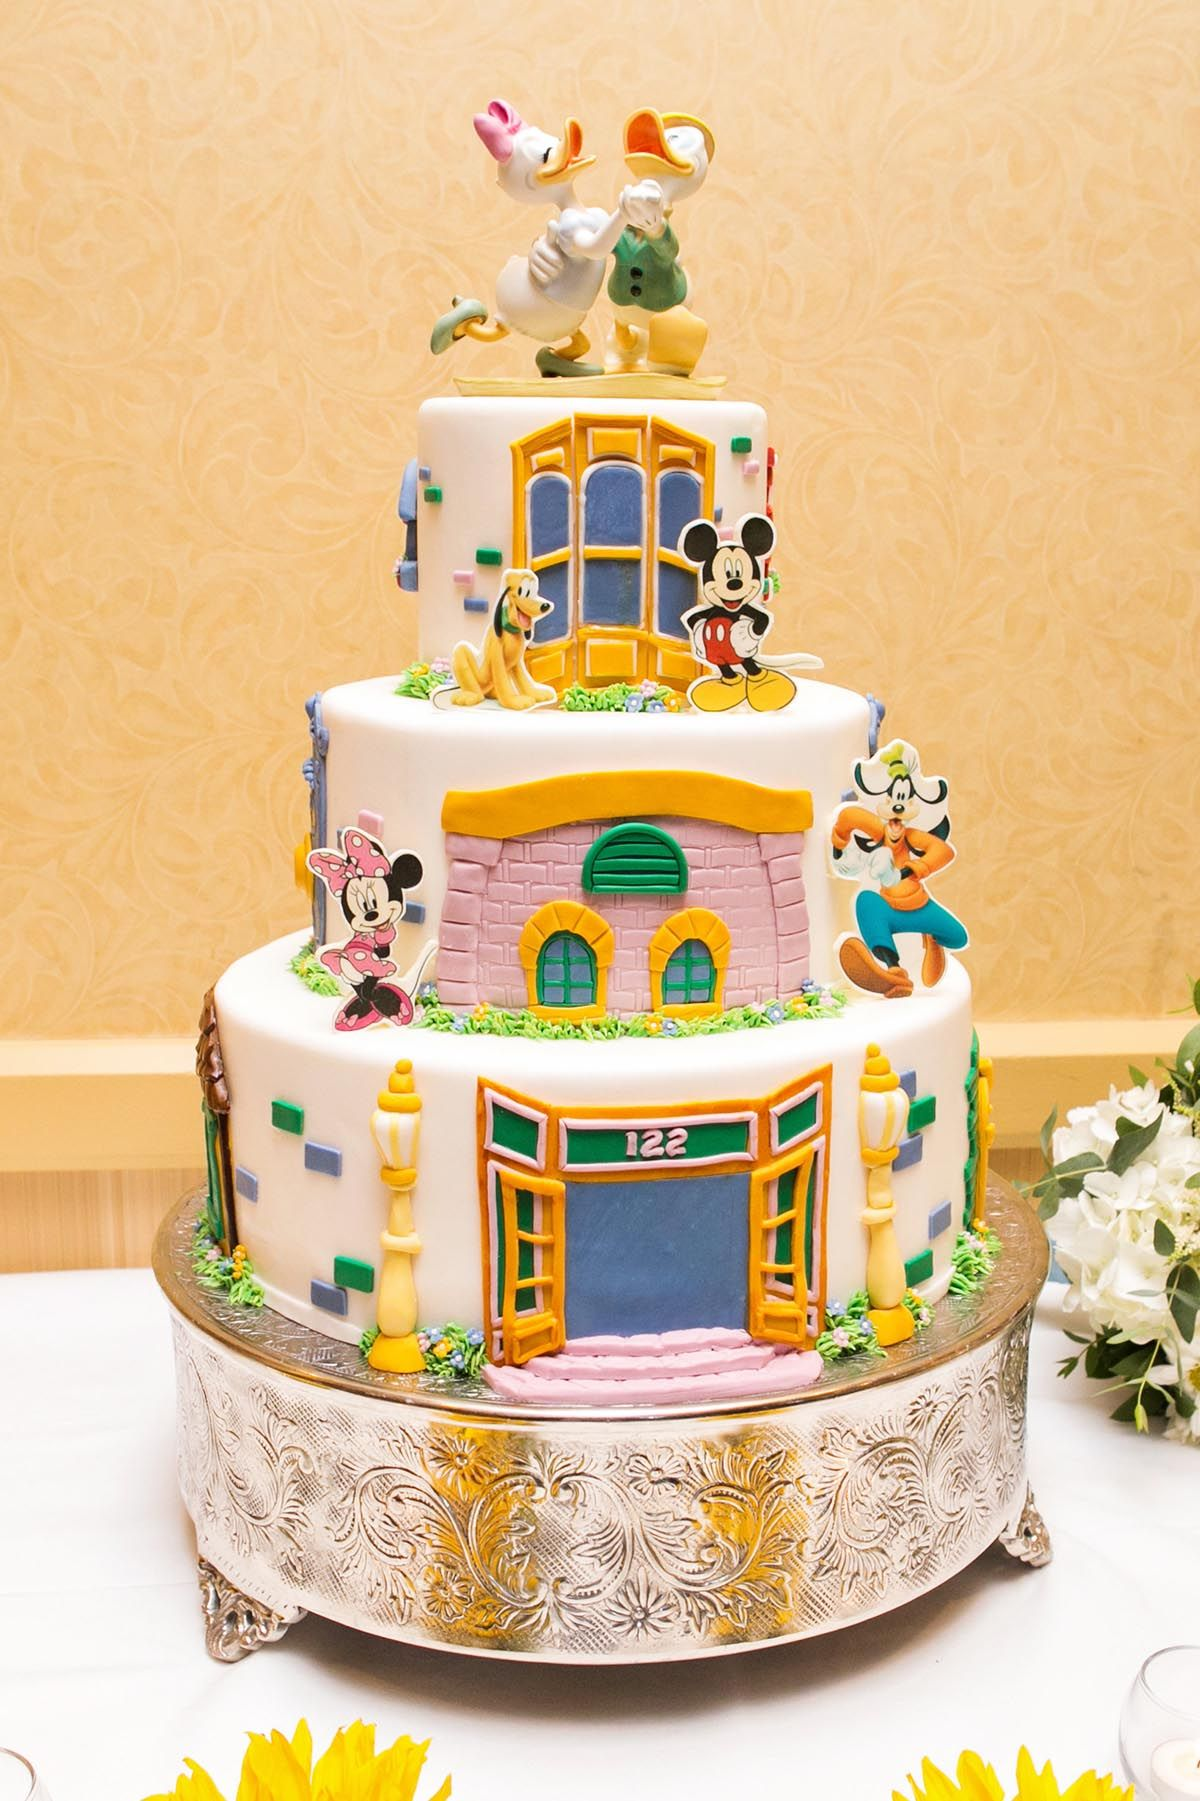 Disneyland wedding cake inspired by Mickey's Toontown